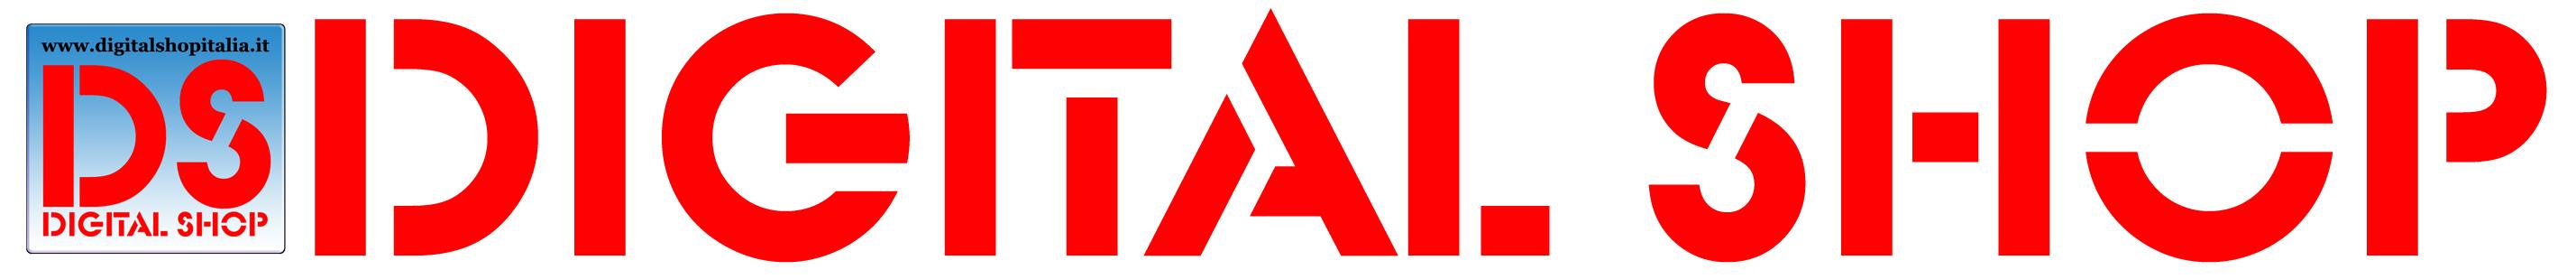 DIGITAL-SHOP-logo-TOTALE-Sfondo-Bianco